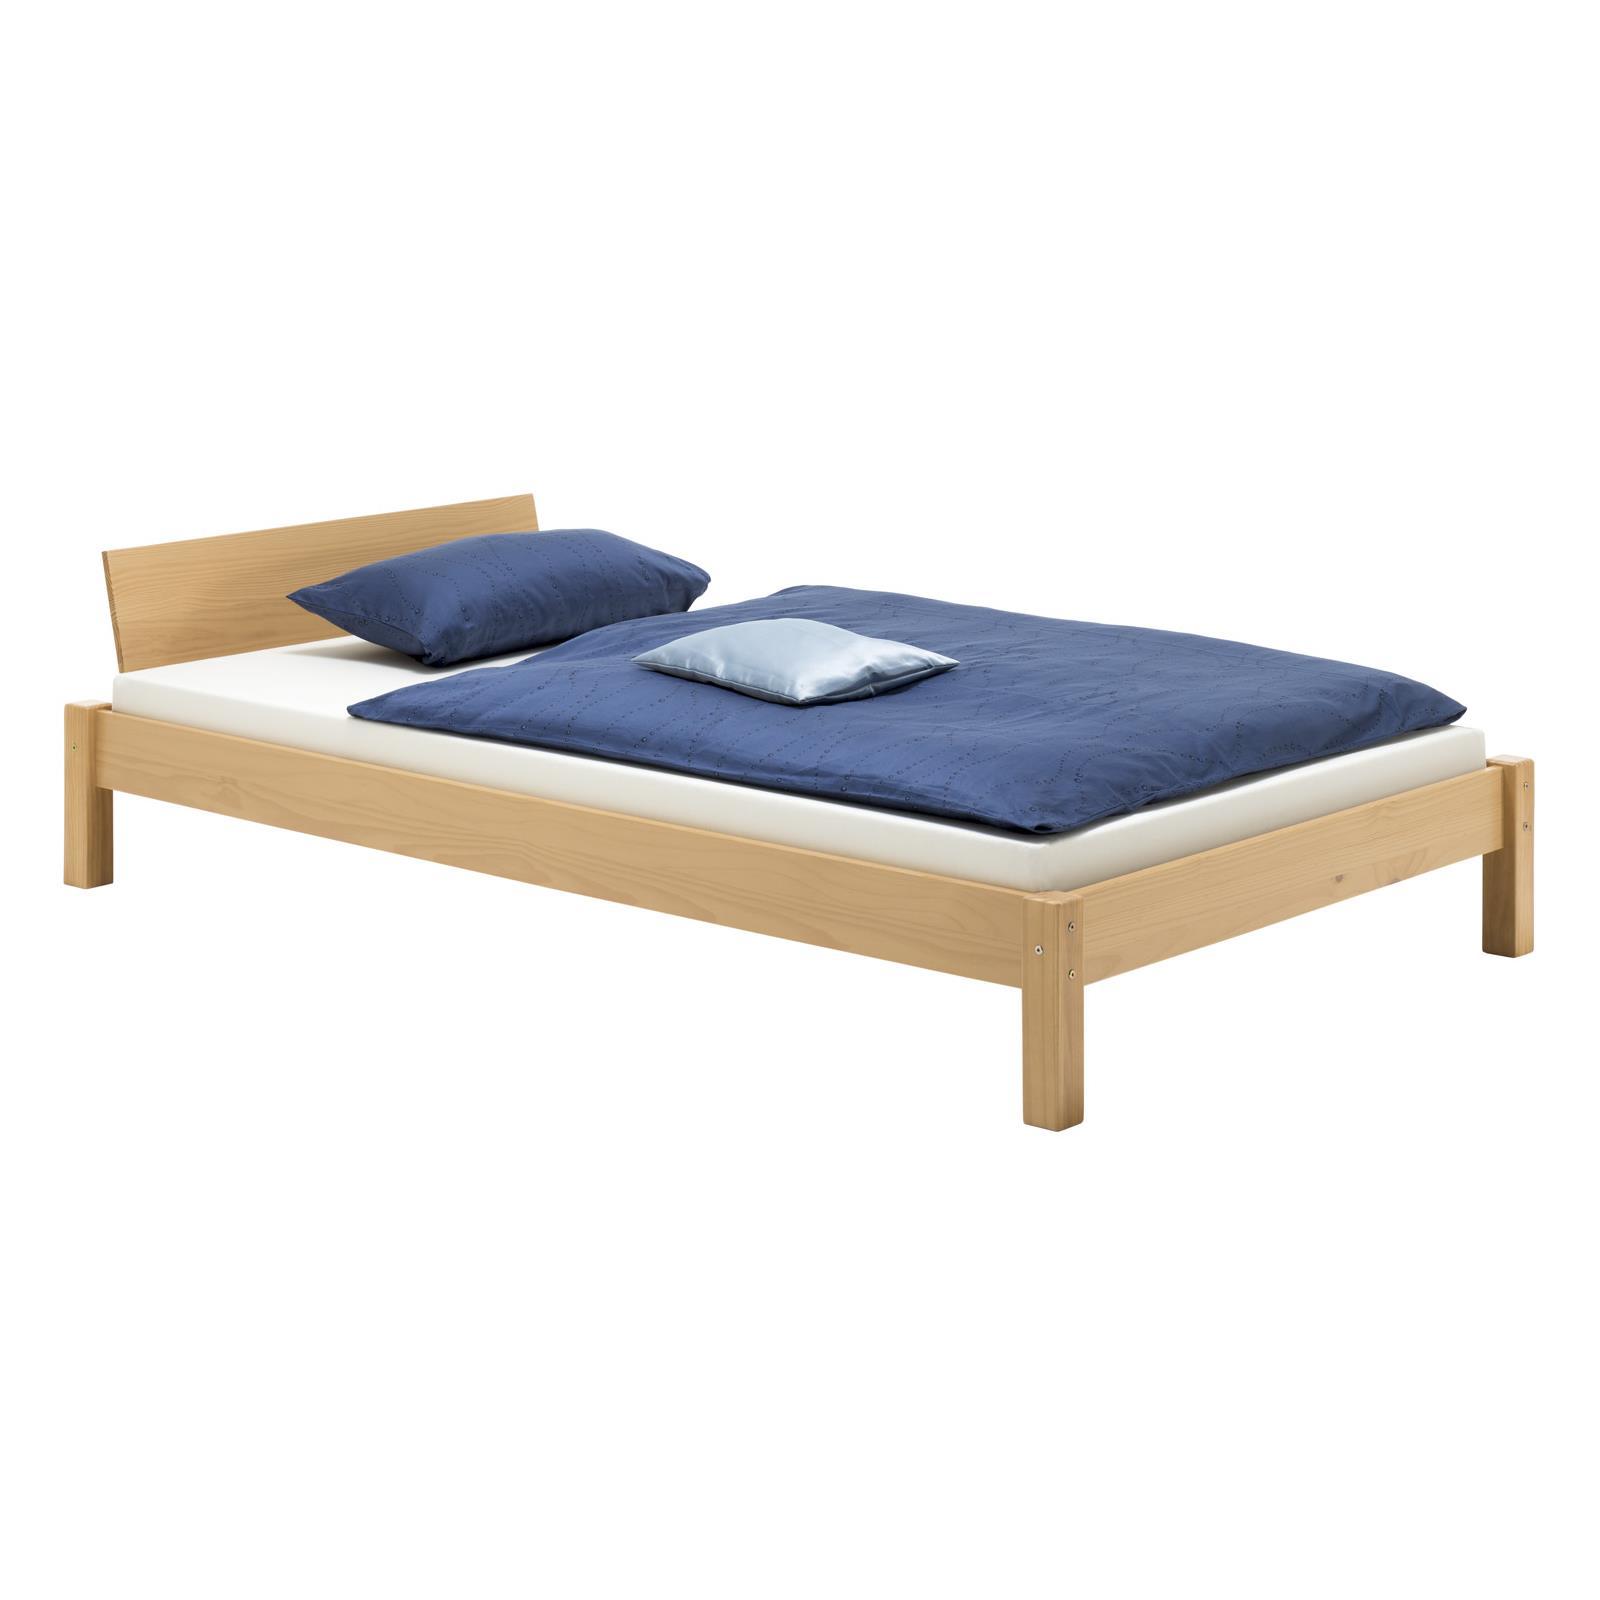 bett einzelbett jugendbett massiv buchefarben 120 x 200 cm neu ebay. Black Bedroom Furniture Sets. Home Design Ideas